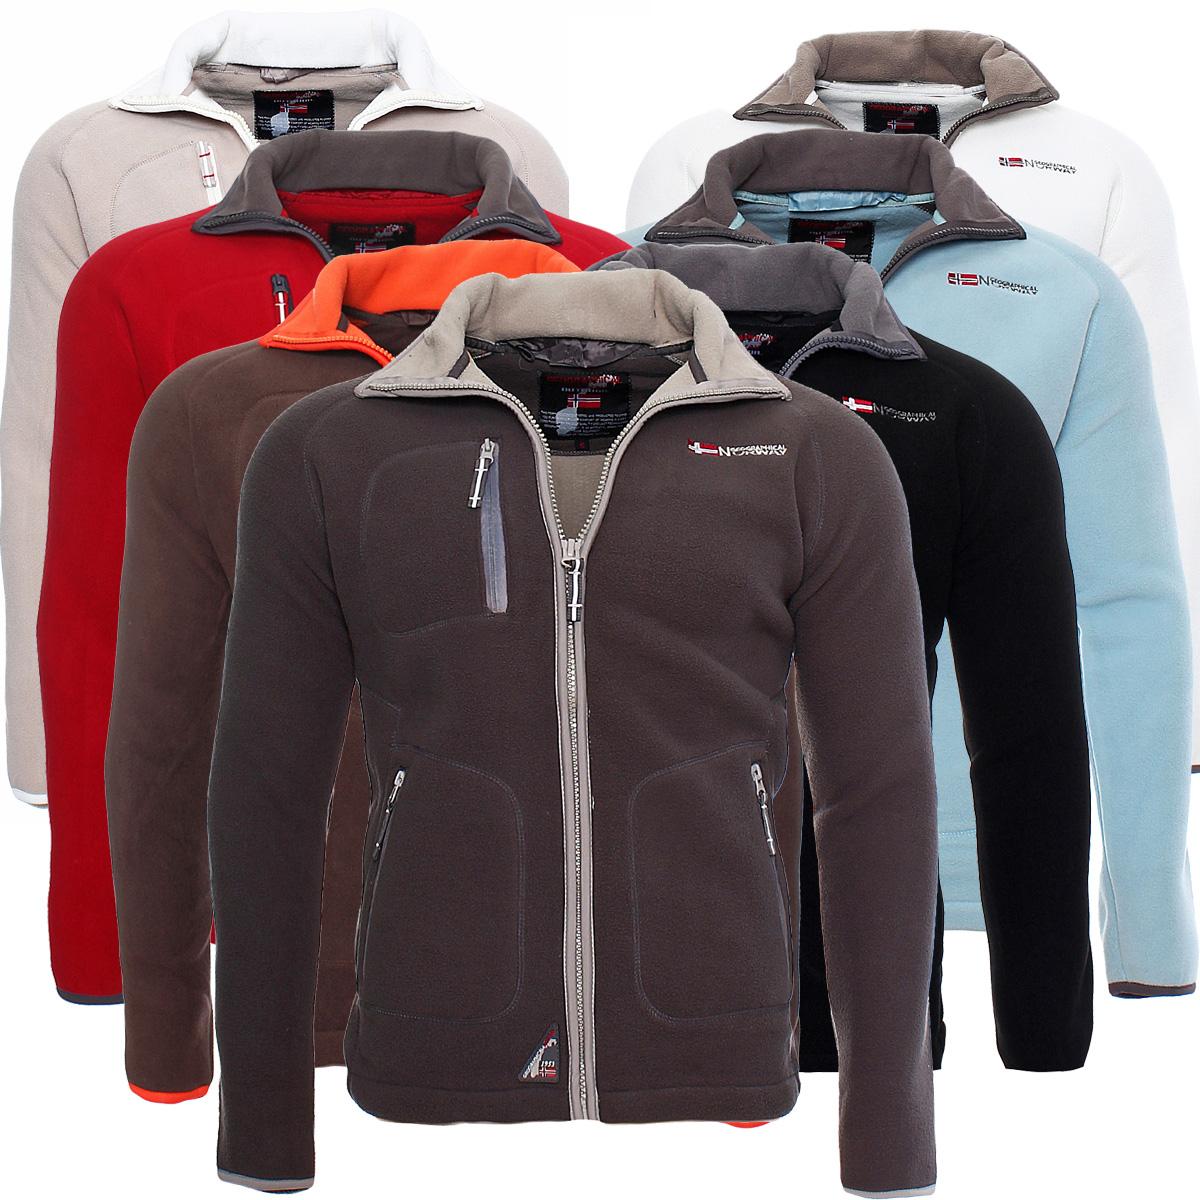 Details about Geographical Norway Trekking Men's Fleece Jacket Hoodie Sweat Jacket Sweater New show original title